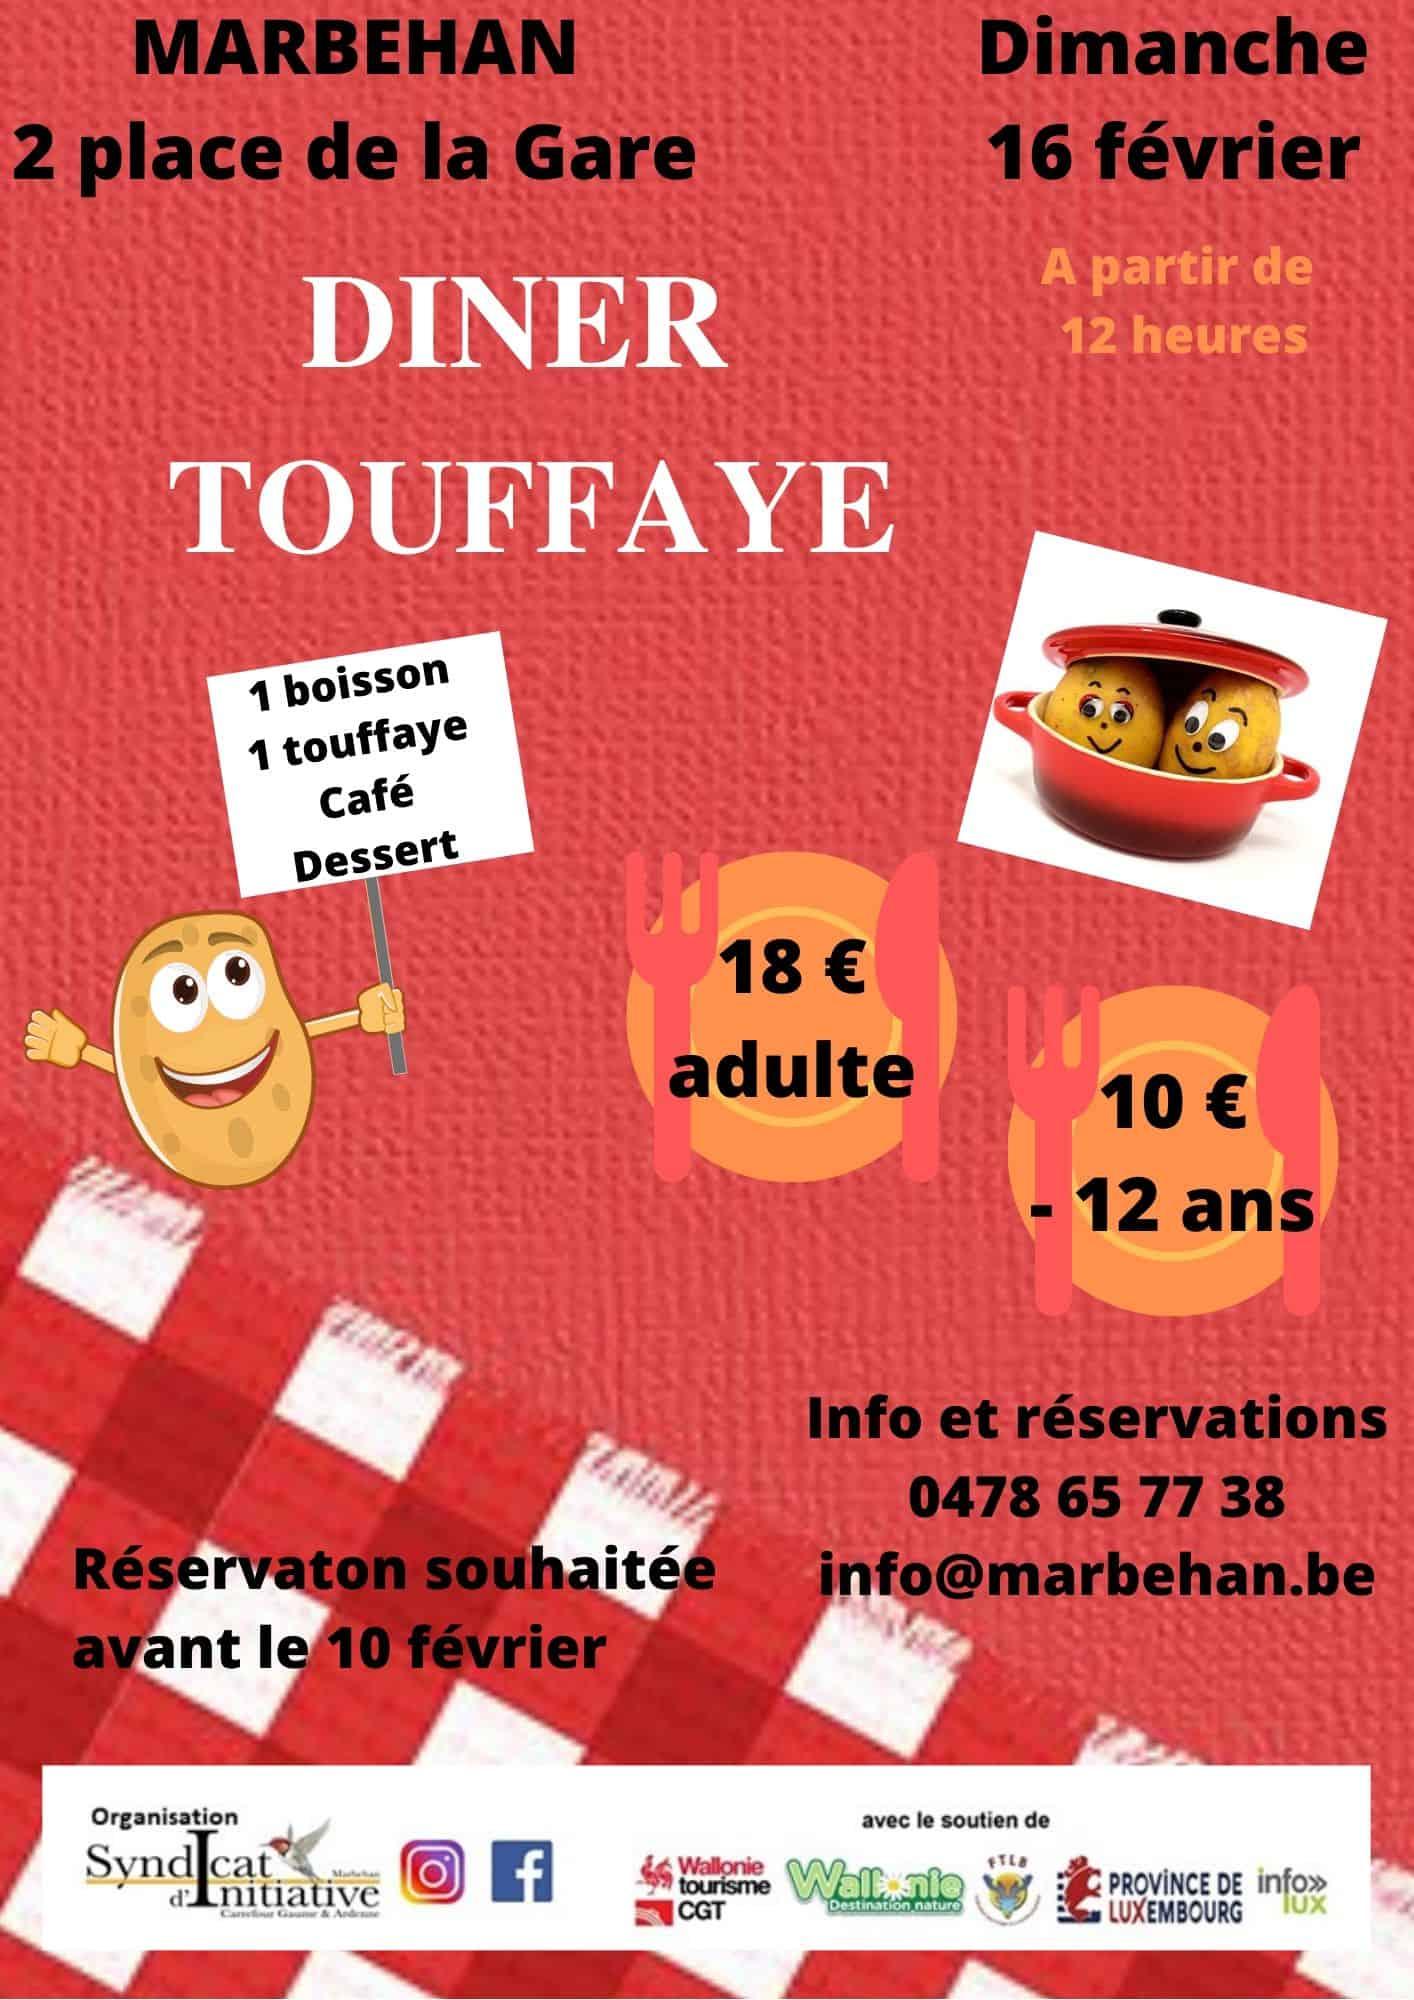 Diner Touffaye - SI Marbehan